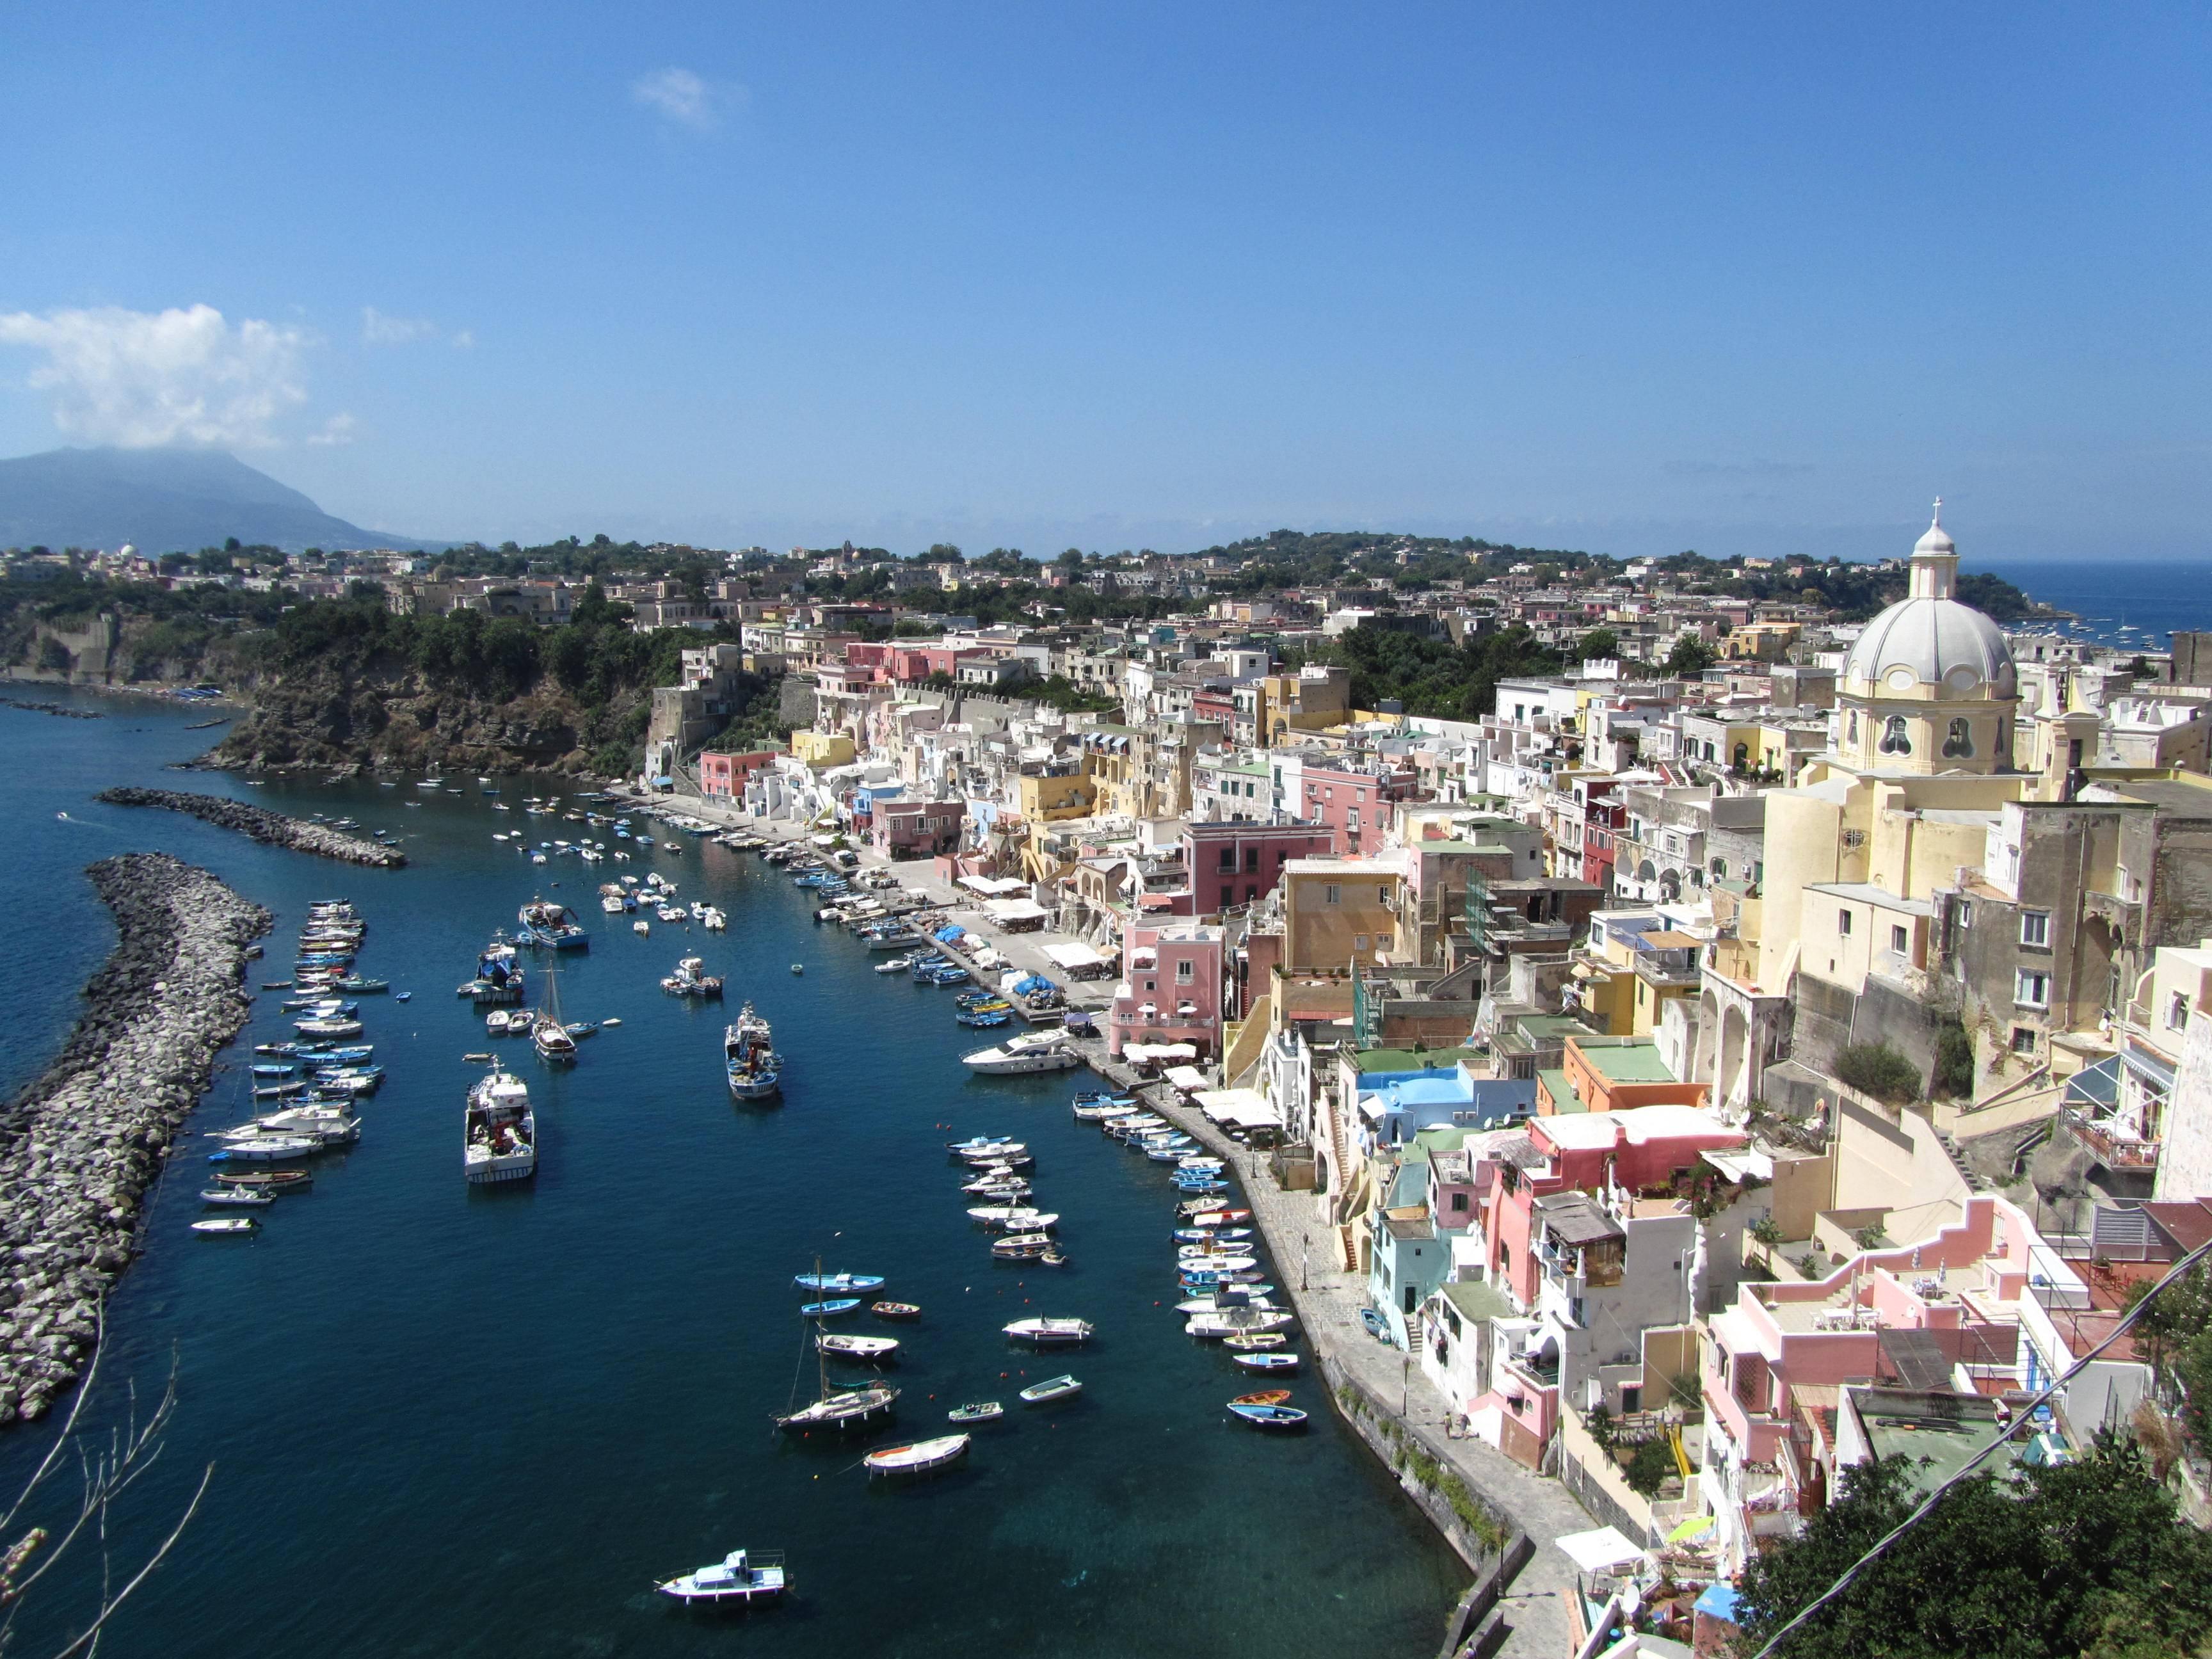 Photo 1: Procida, petite perle au large de Naples